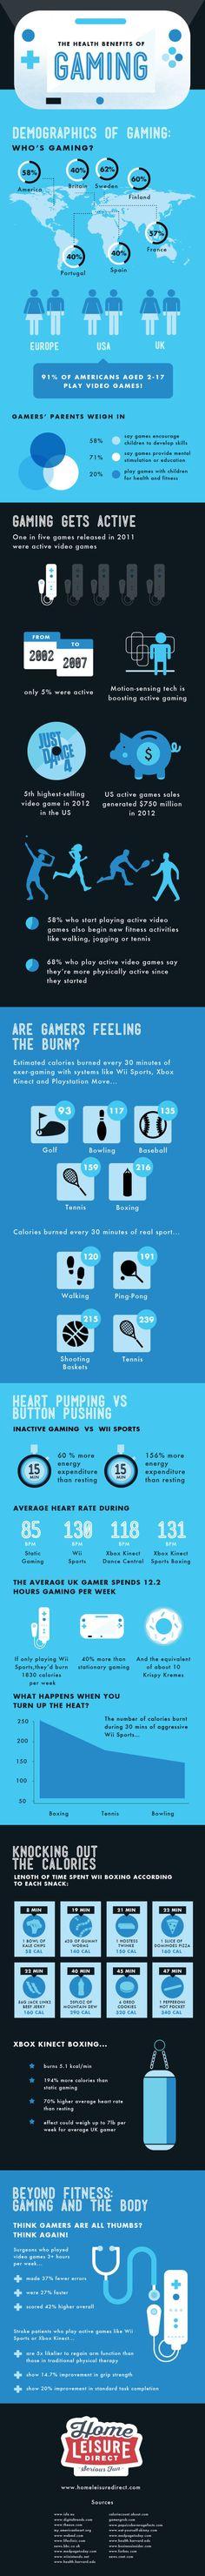 Vital Health Benefits of Gaming   Casino Infographics: